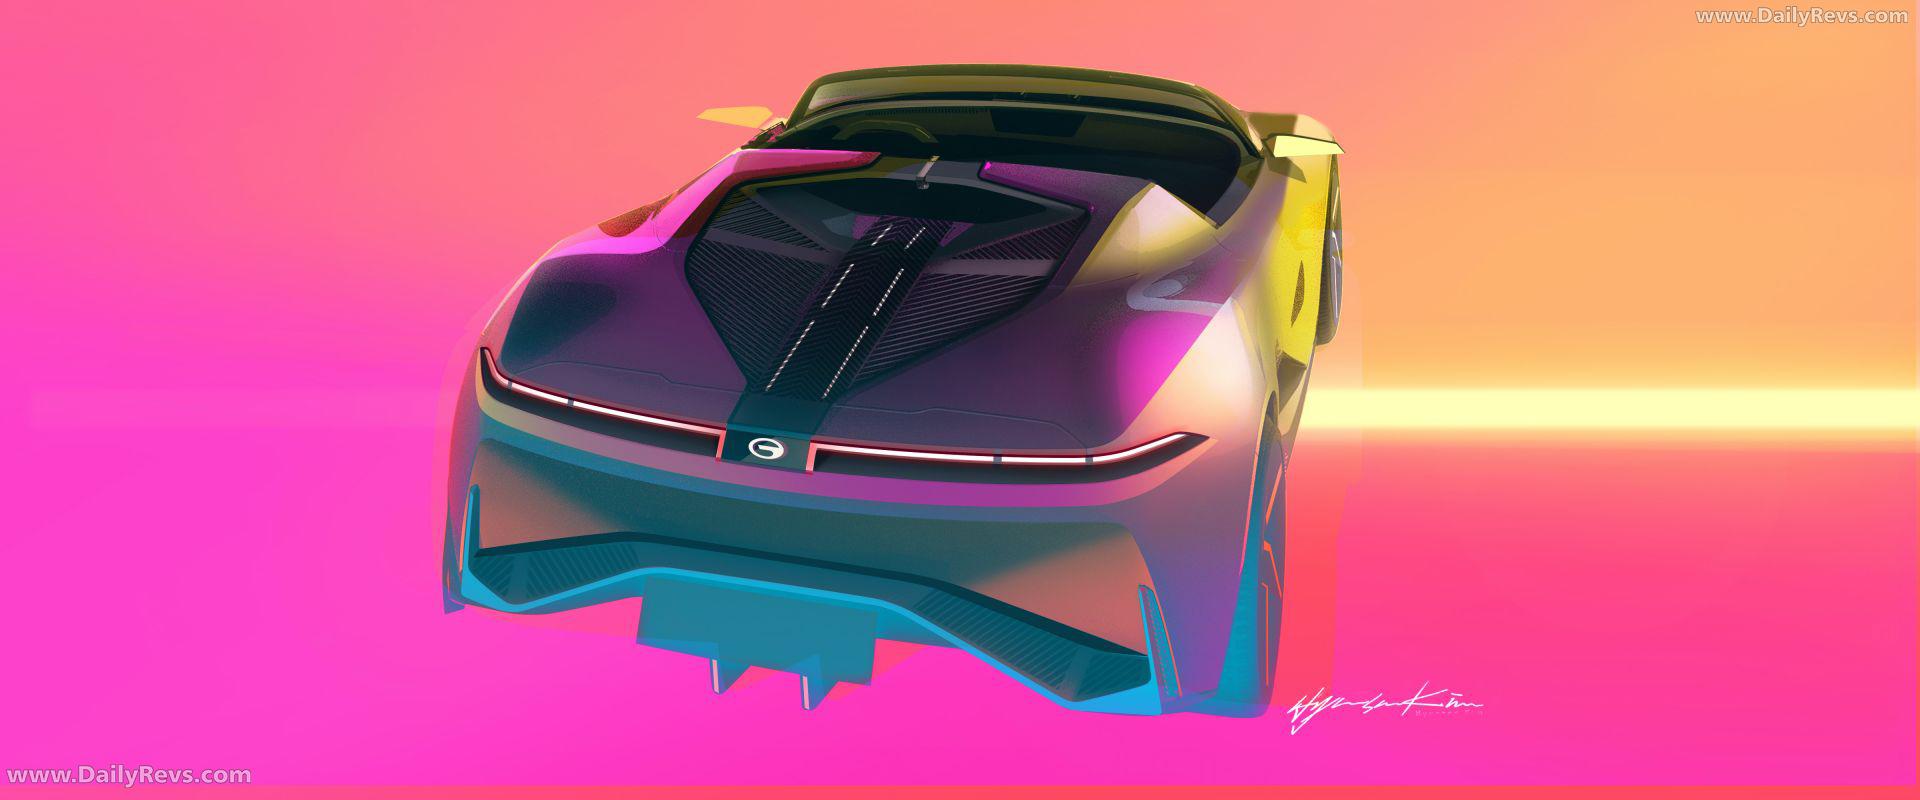 2020 GAC Enpulse Concept full